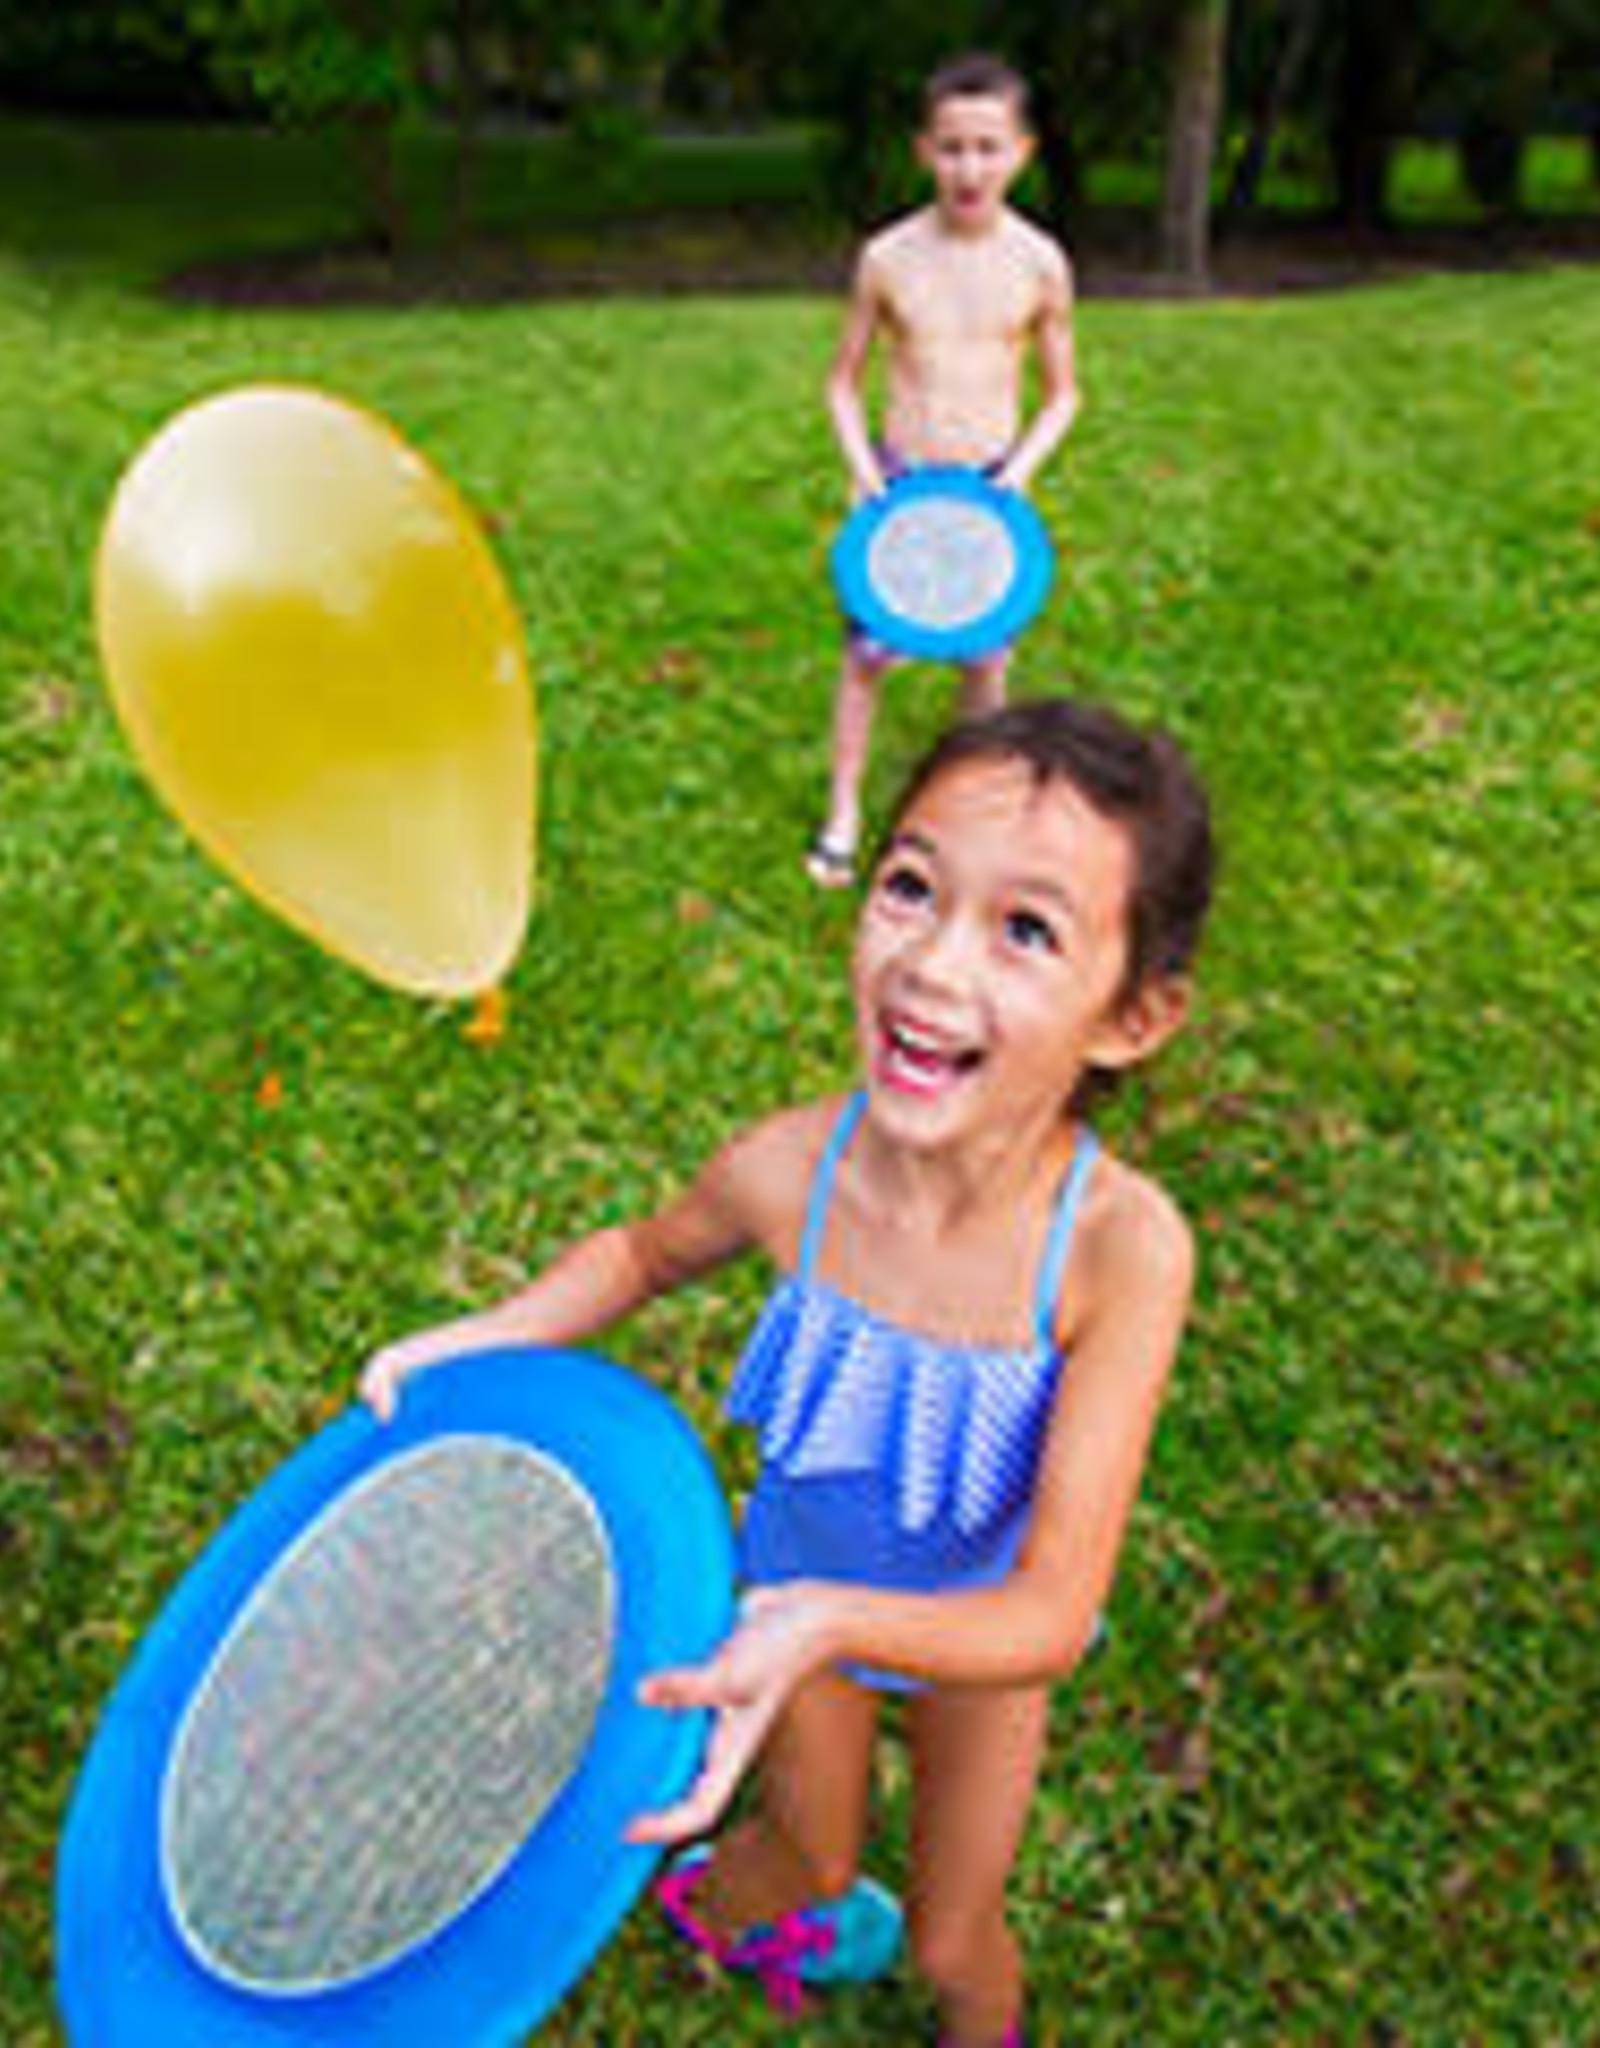 Ogo disk H2O Water Balloon Toss Disk Set